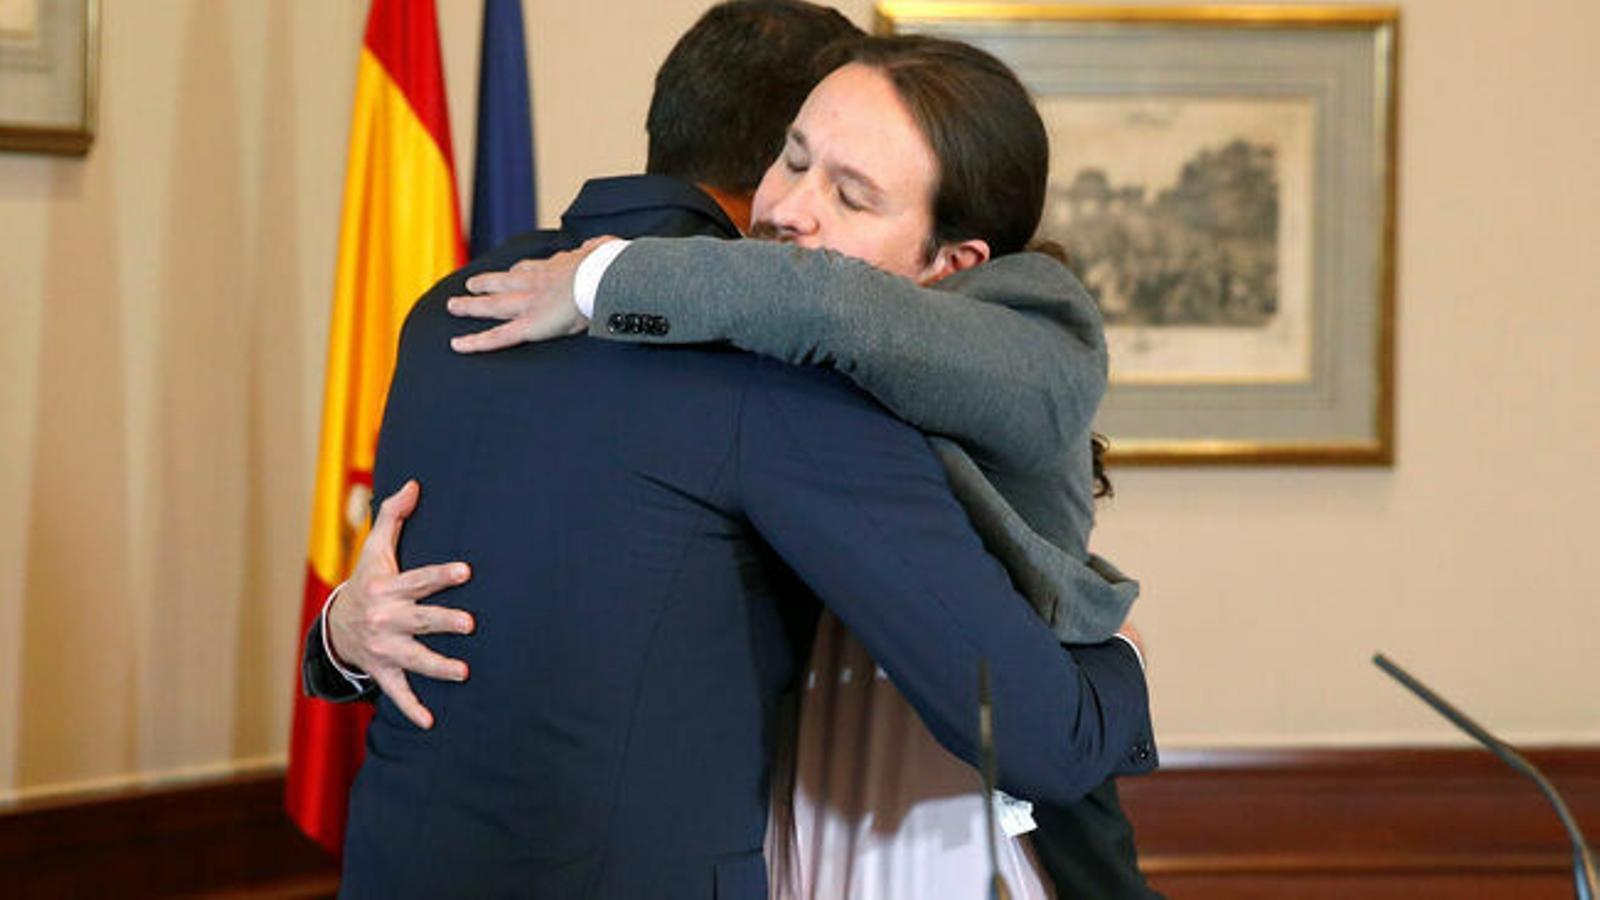 Sánchez abraça Iglesias per fer un govern de coalició sense vetos